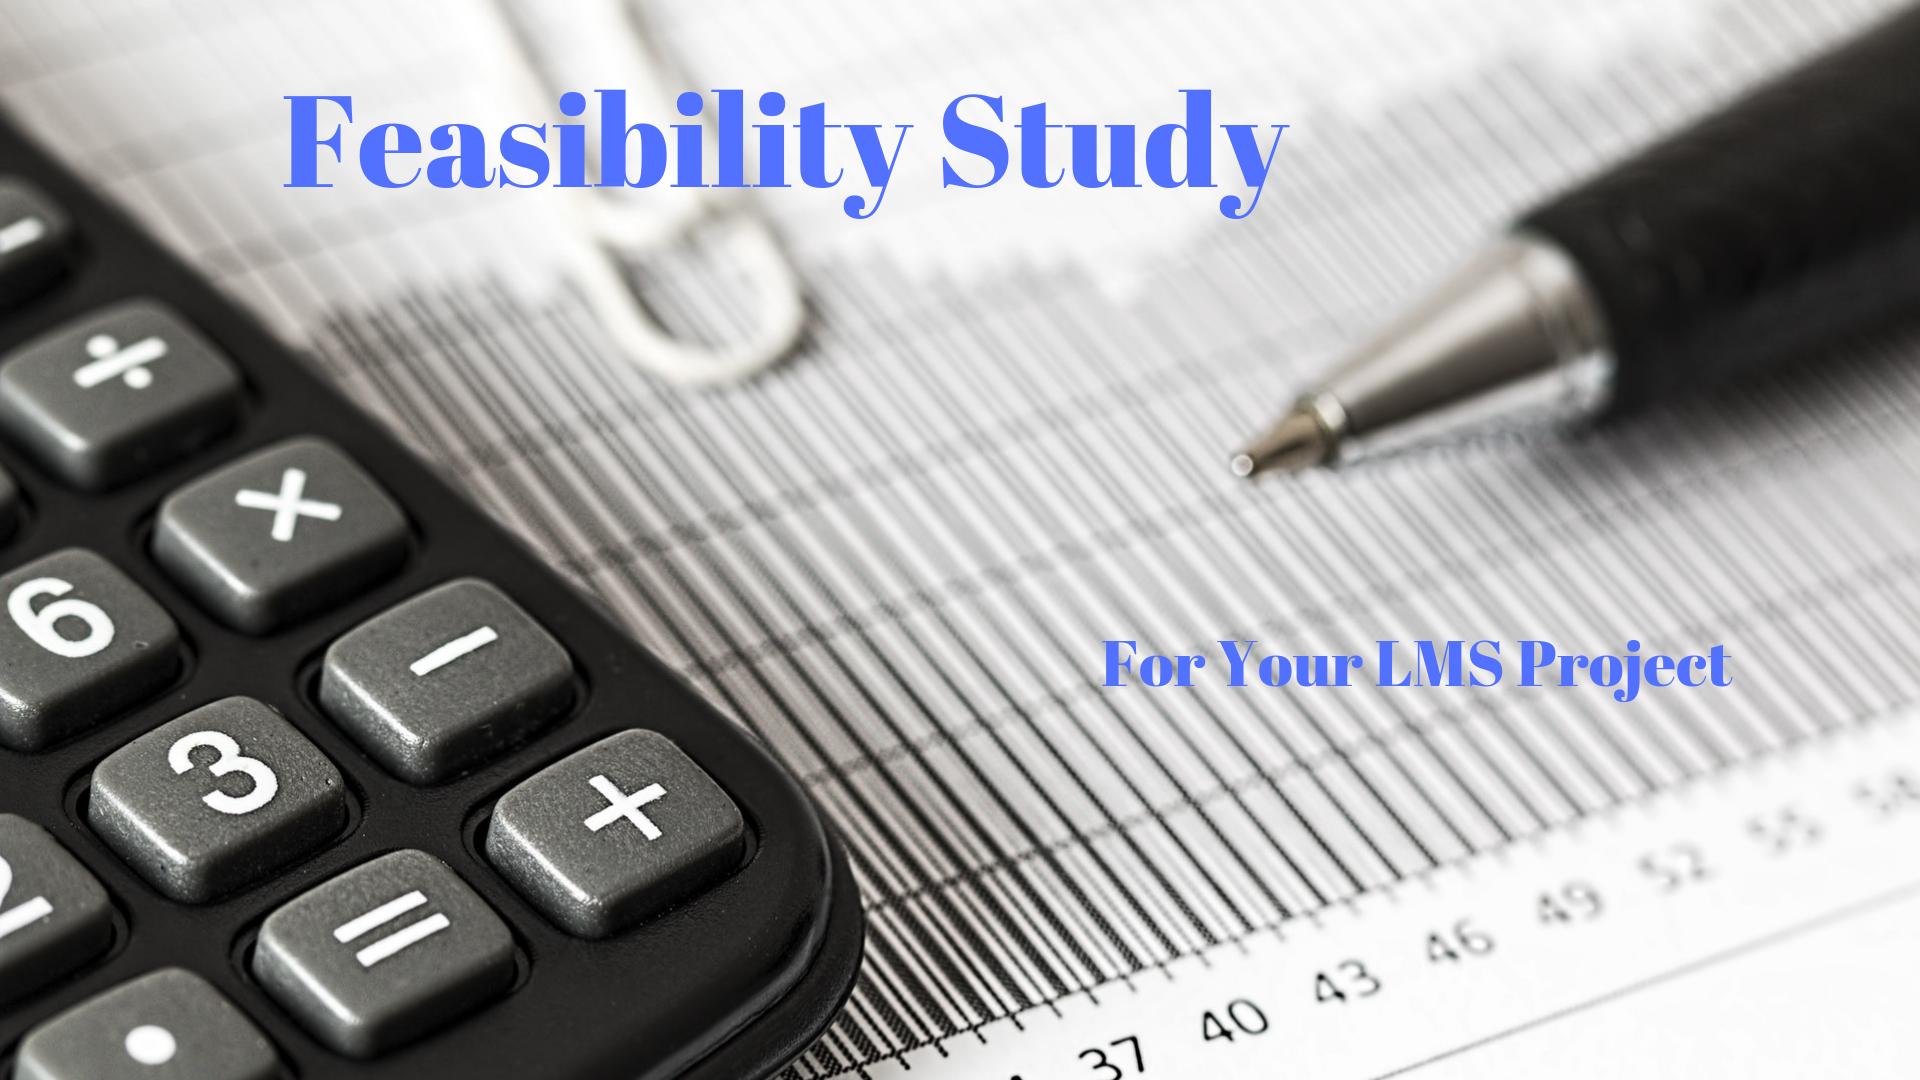 Feasibility Study